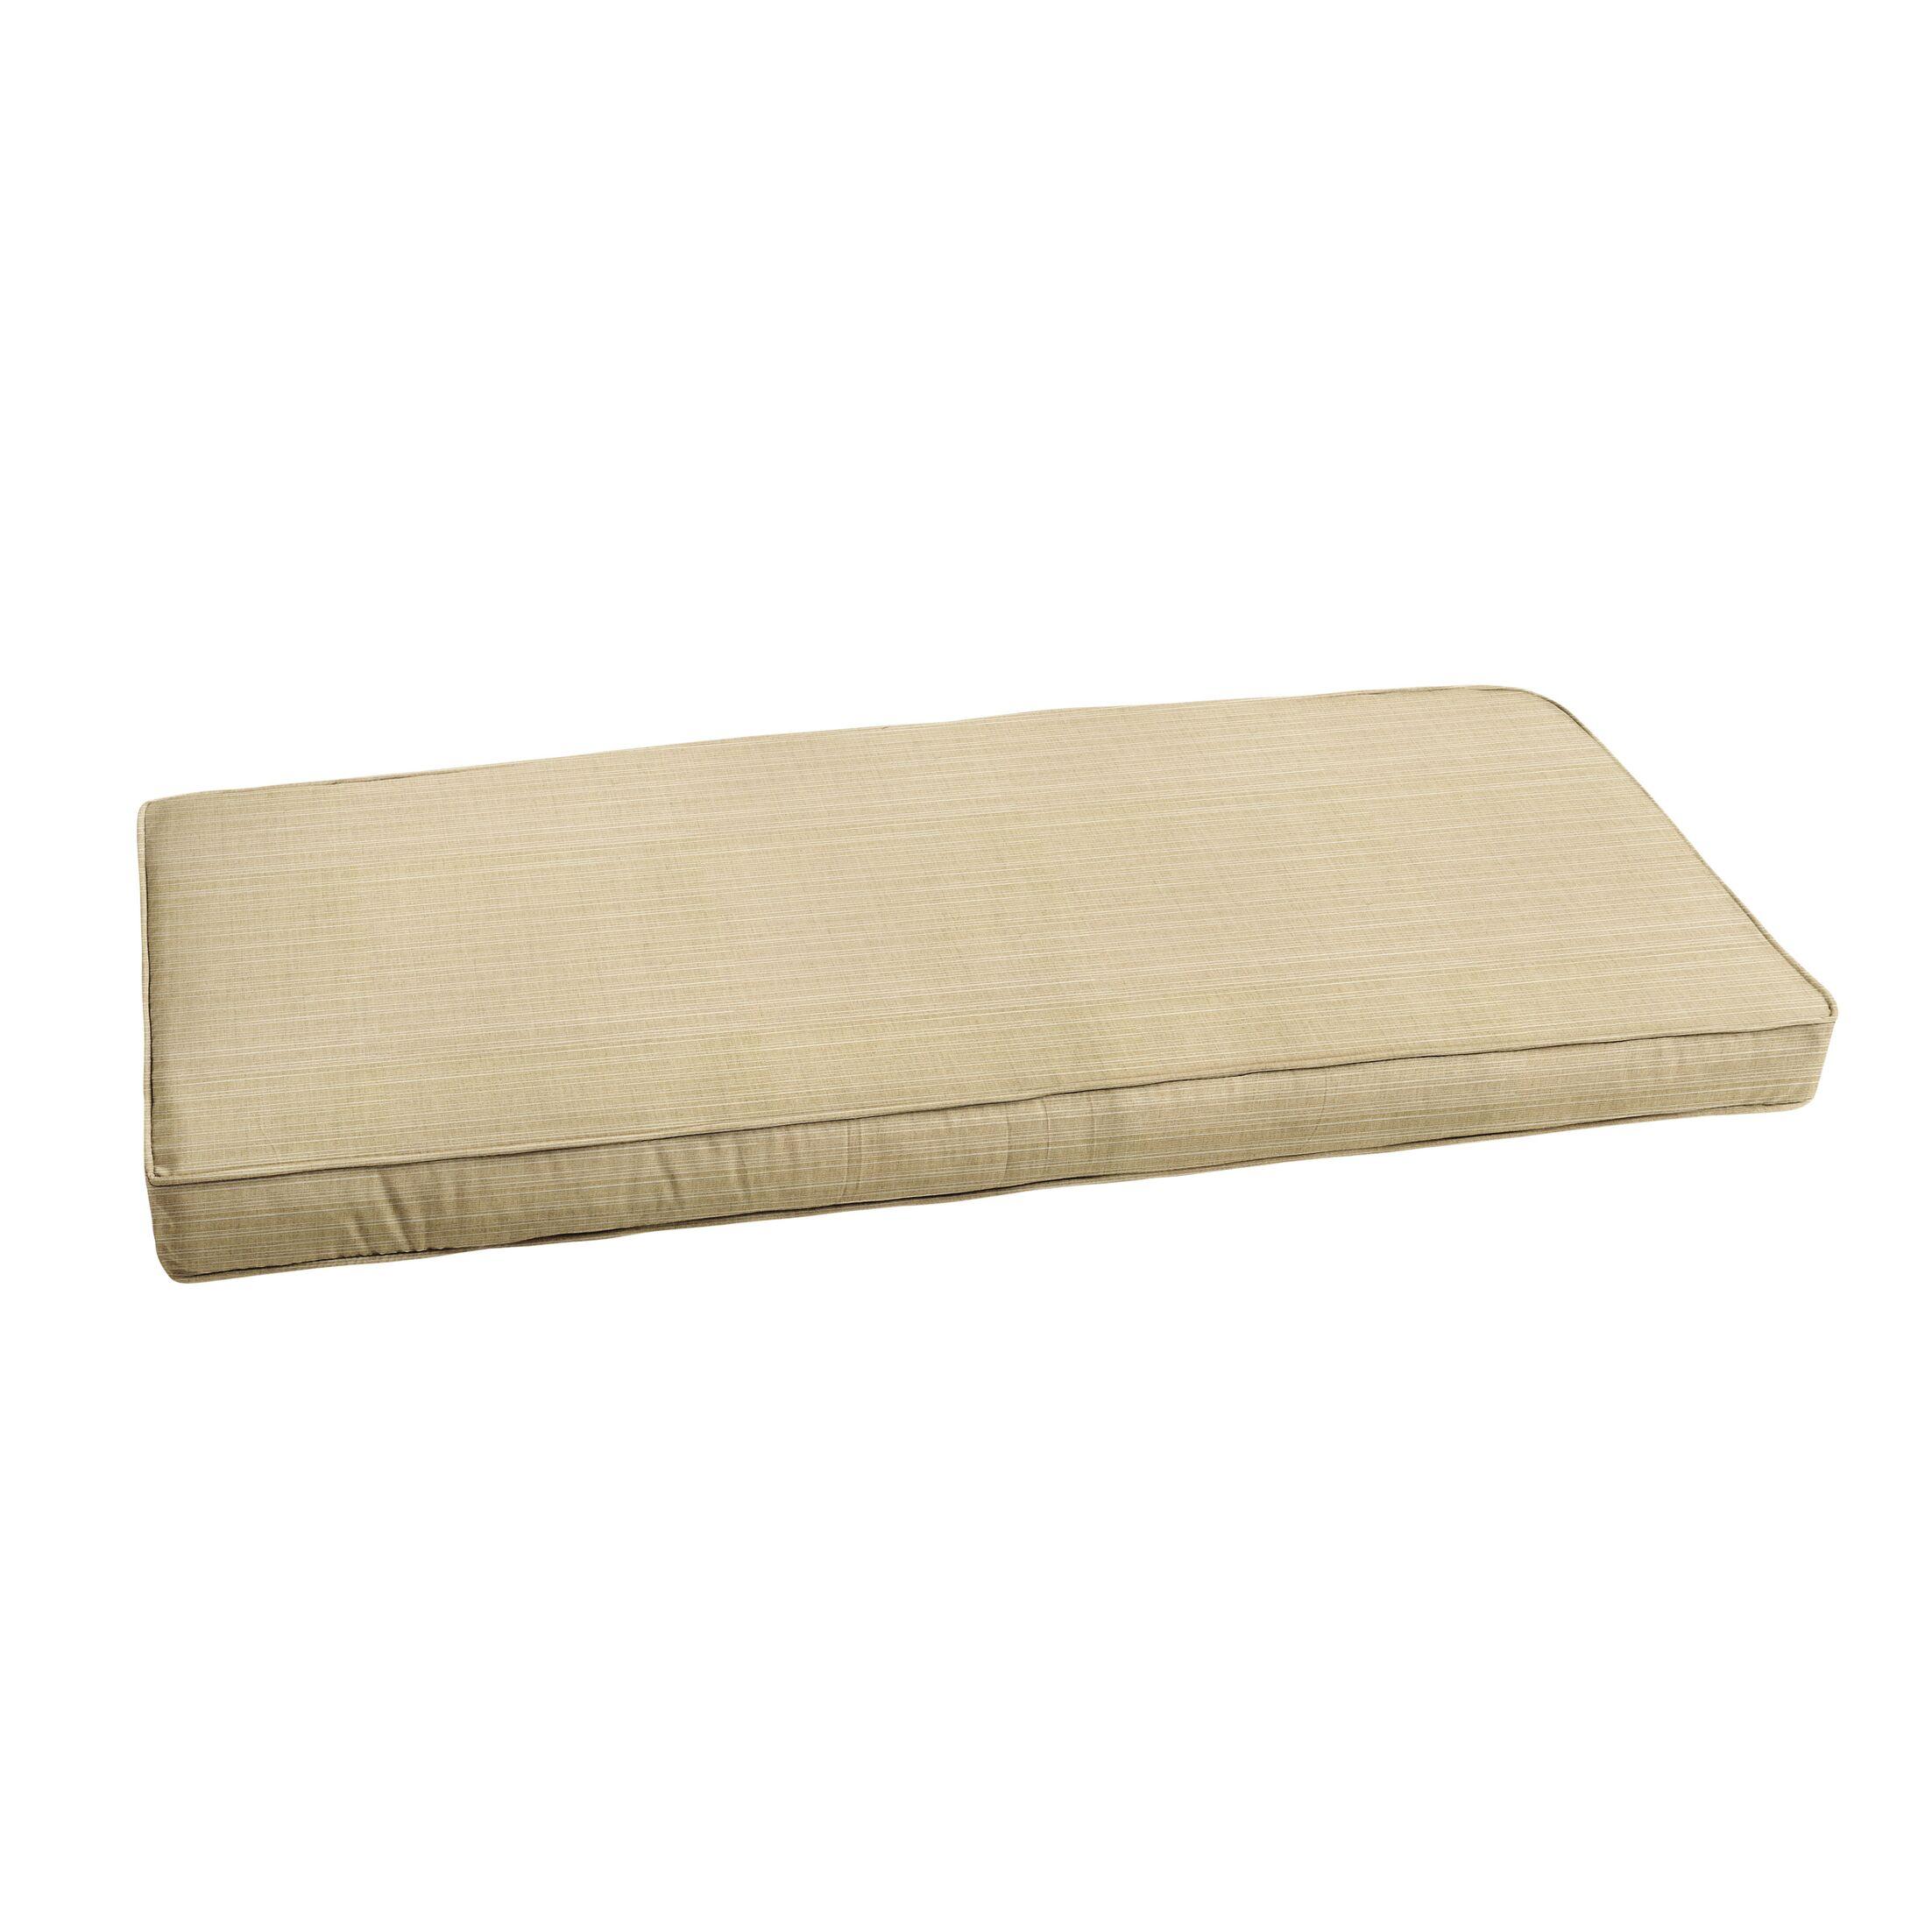 Textured Indoor/Outdoor Sunbrella Bench Cushion Size: 45